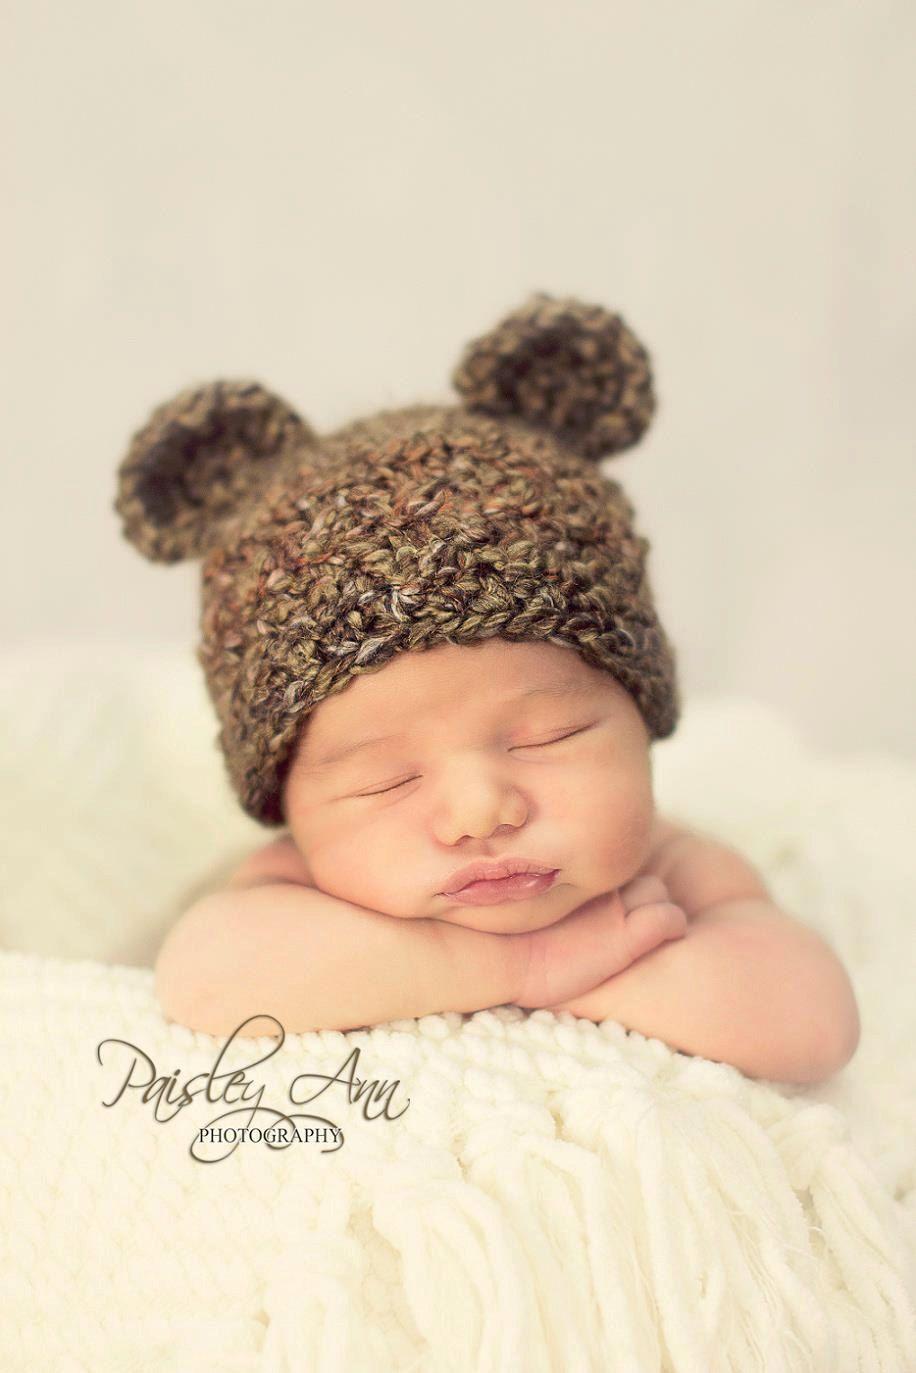 Teddy Bear Crochet Baby Hat  - Crochet Photography Prop - Brown - Size Newborn, 0-3 mos, 3-6 mos, 6-12 mos. $28.50, via Etsy.